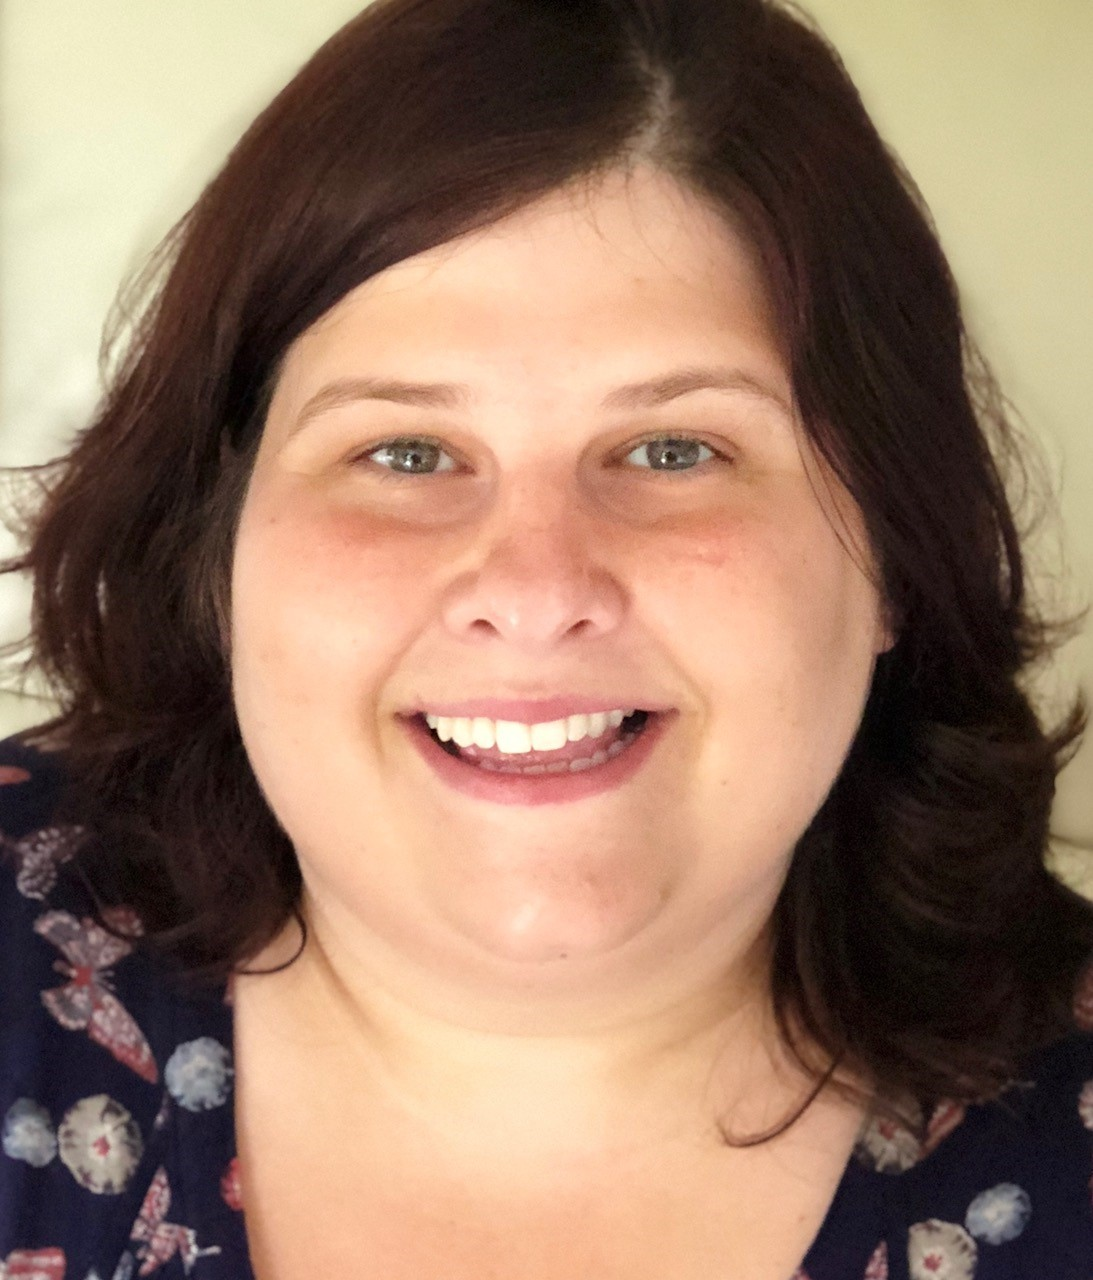 Lucy Wellbeing Support Worker Abingdon